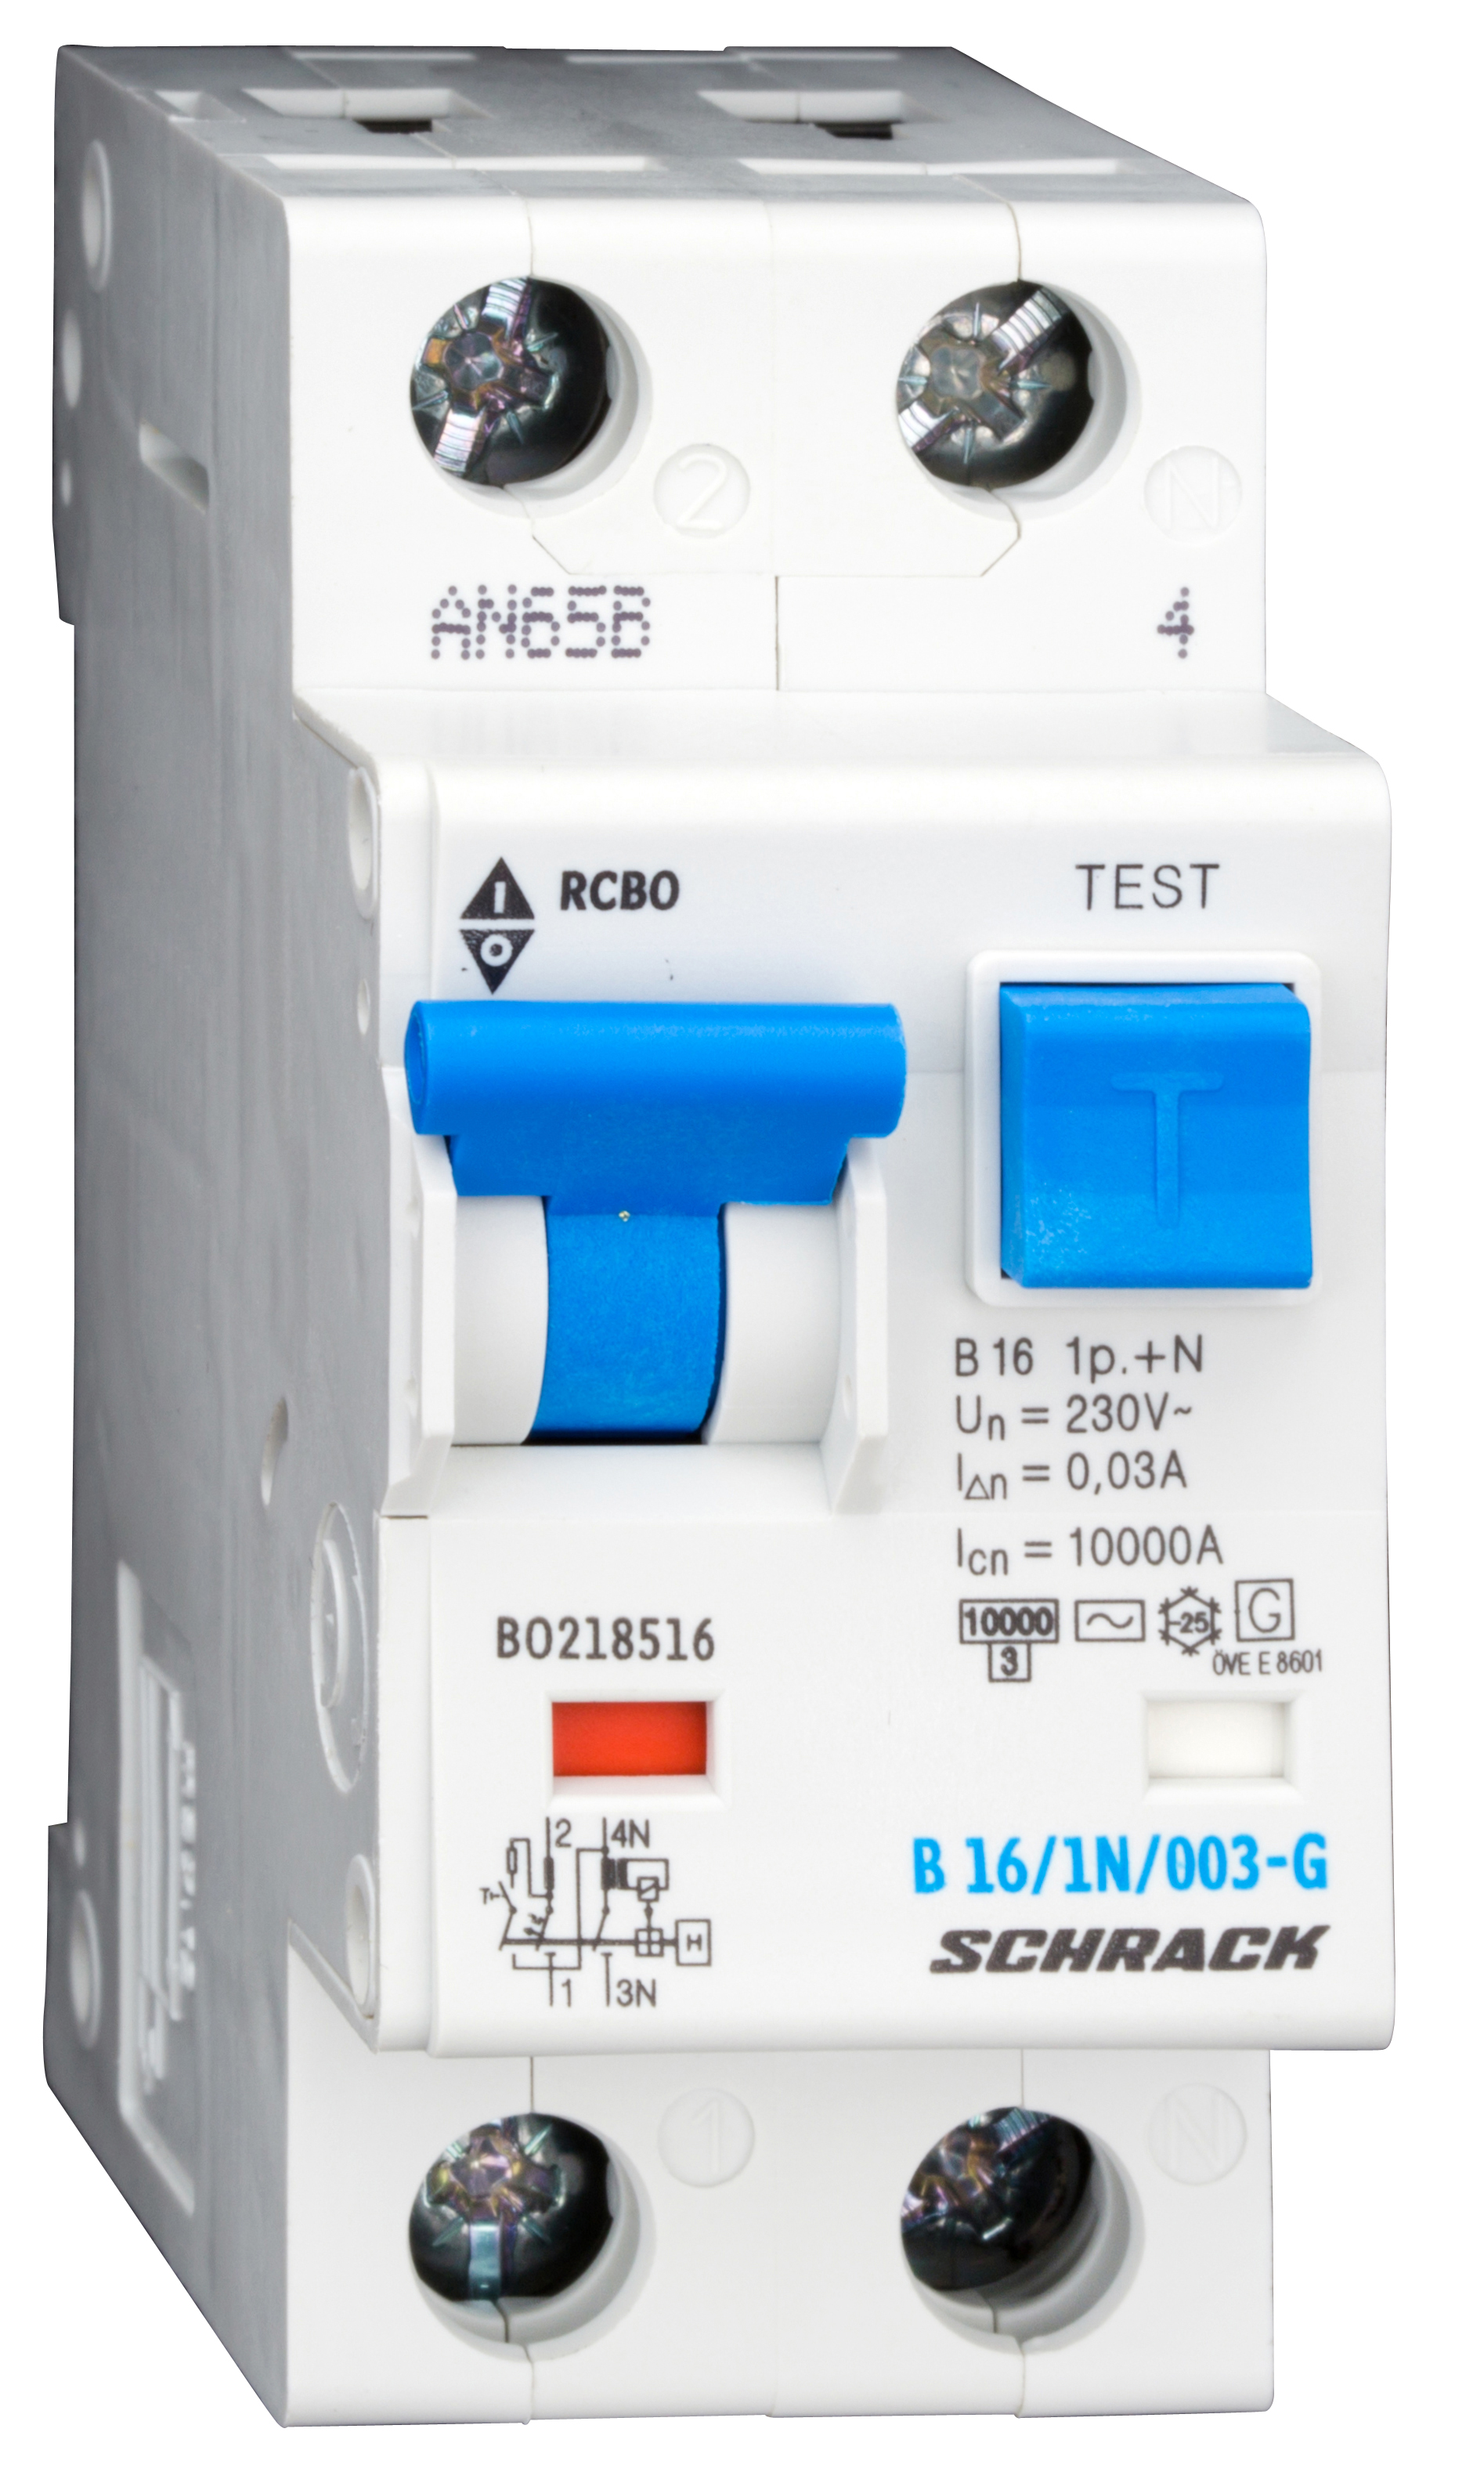 1 Stk LS-FI-Schalter,Kennl. B,16A,30mA,1-polig+N, Bauart G,Typ AC BO218516--